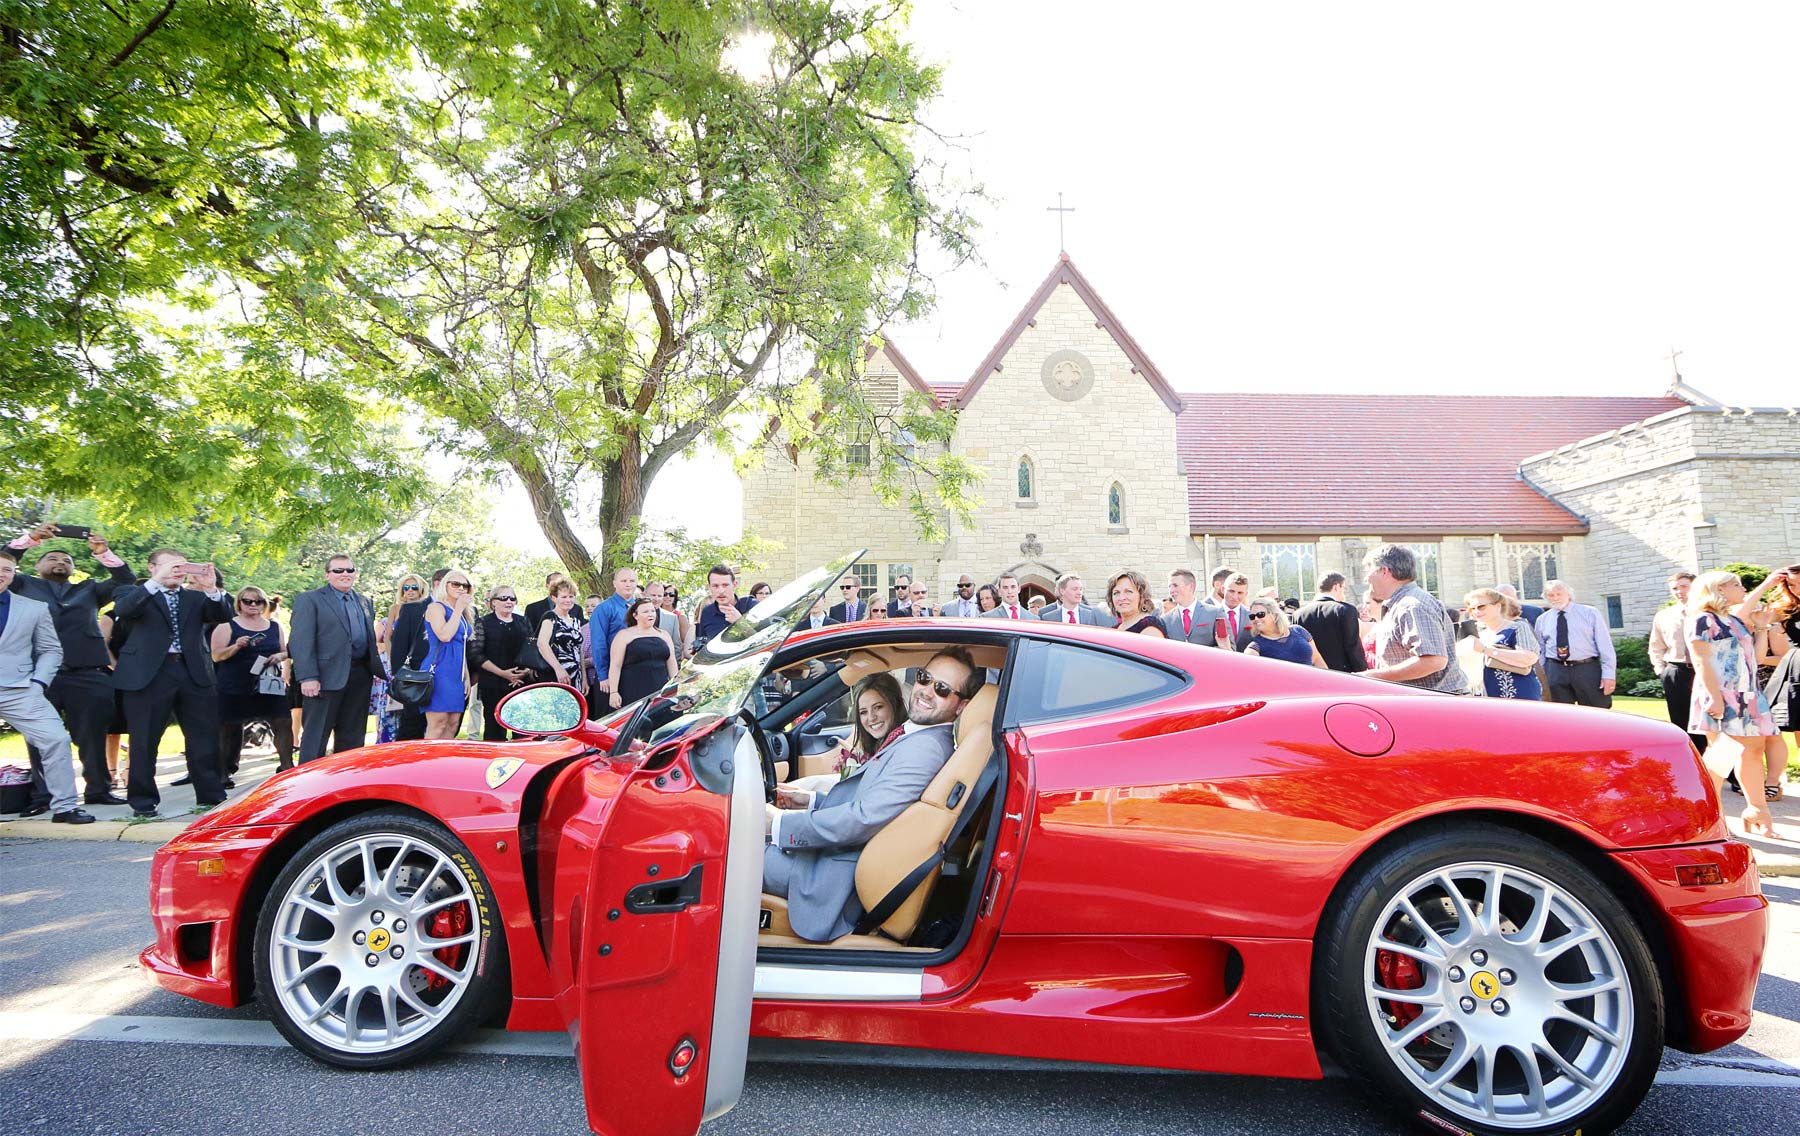 18-Minneapolis-Minnesota-Wedding-Photographer-by-Andrew-Vick-Photography-Summer-Diamond-Lake-Church-Classic-Car-Bride-Groom-Natalie-and-Andrew.jpg